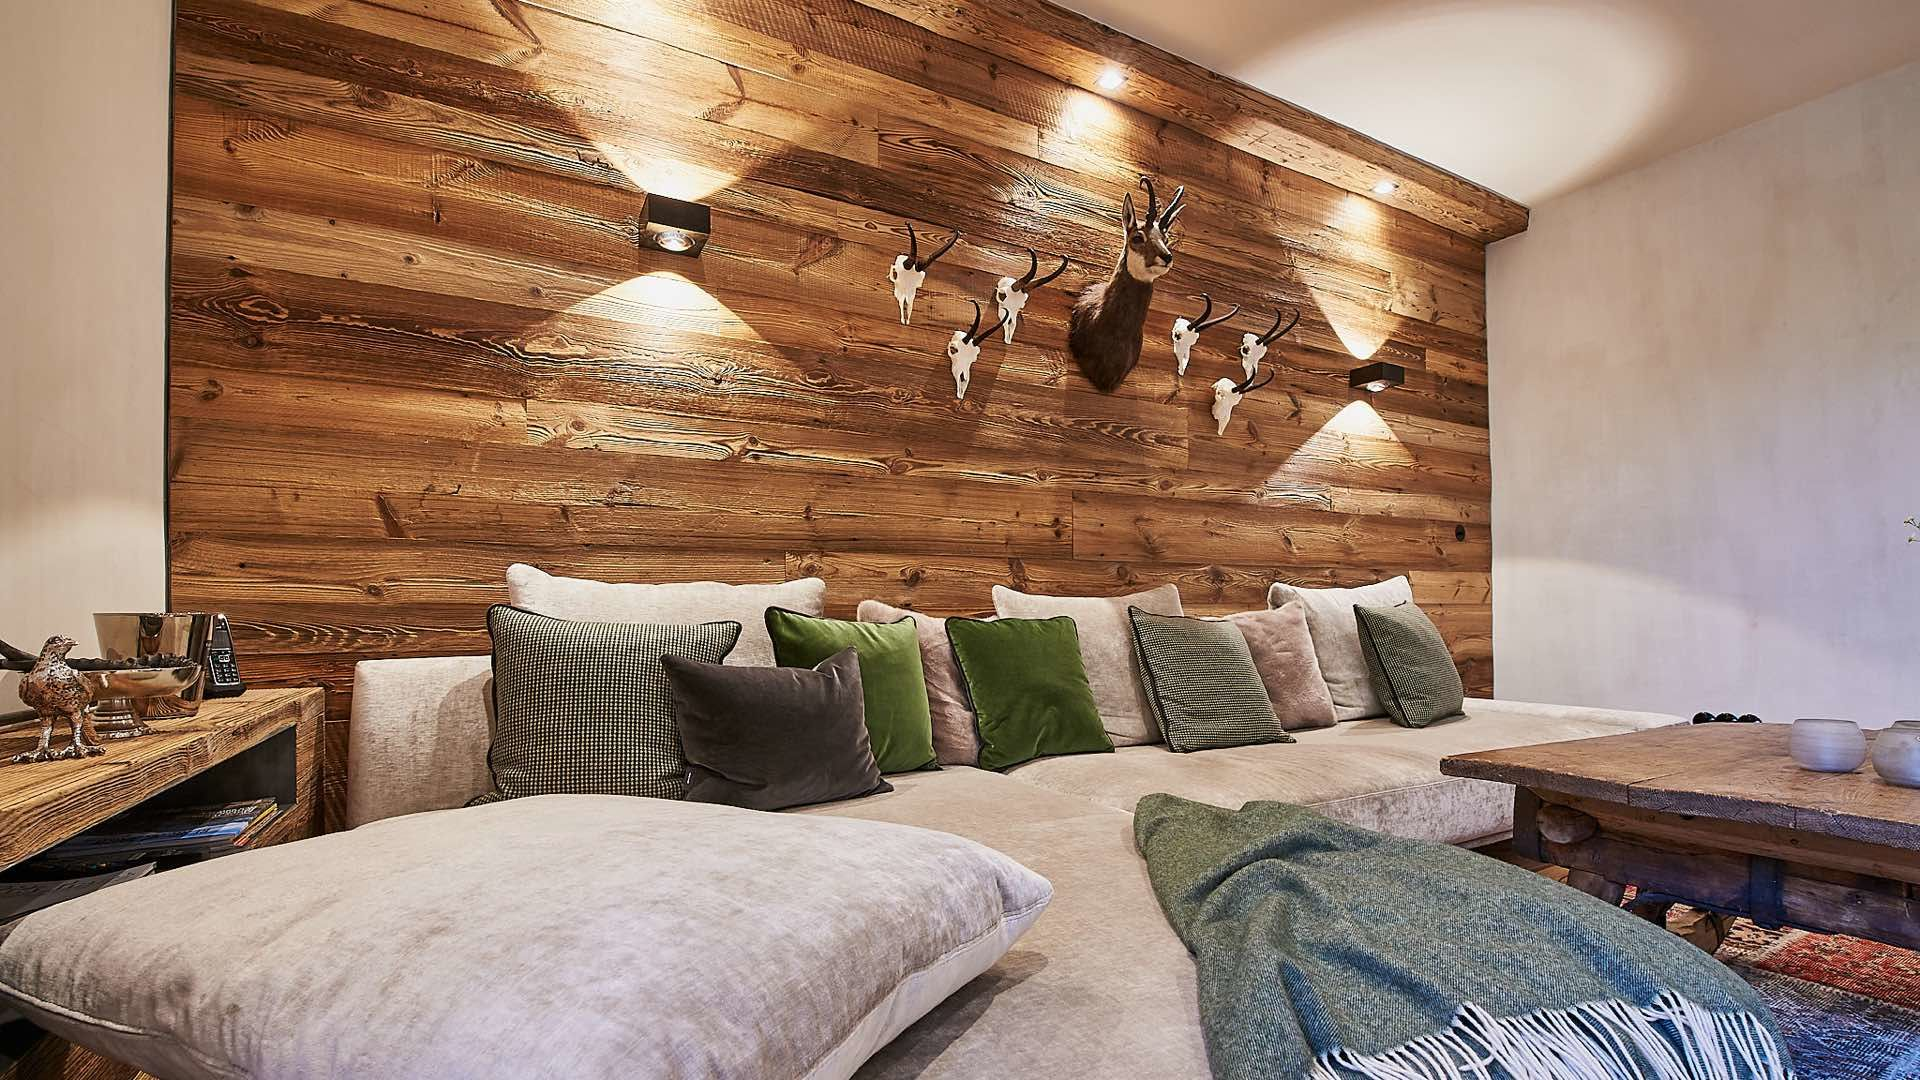 Holzwand mit LED Lampen, Wohnzimmer, Kitzbühel